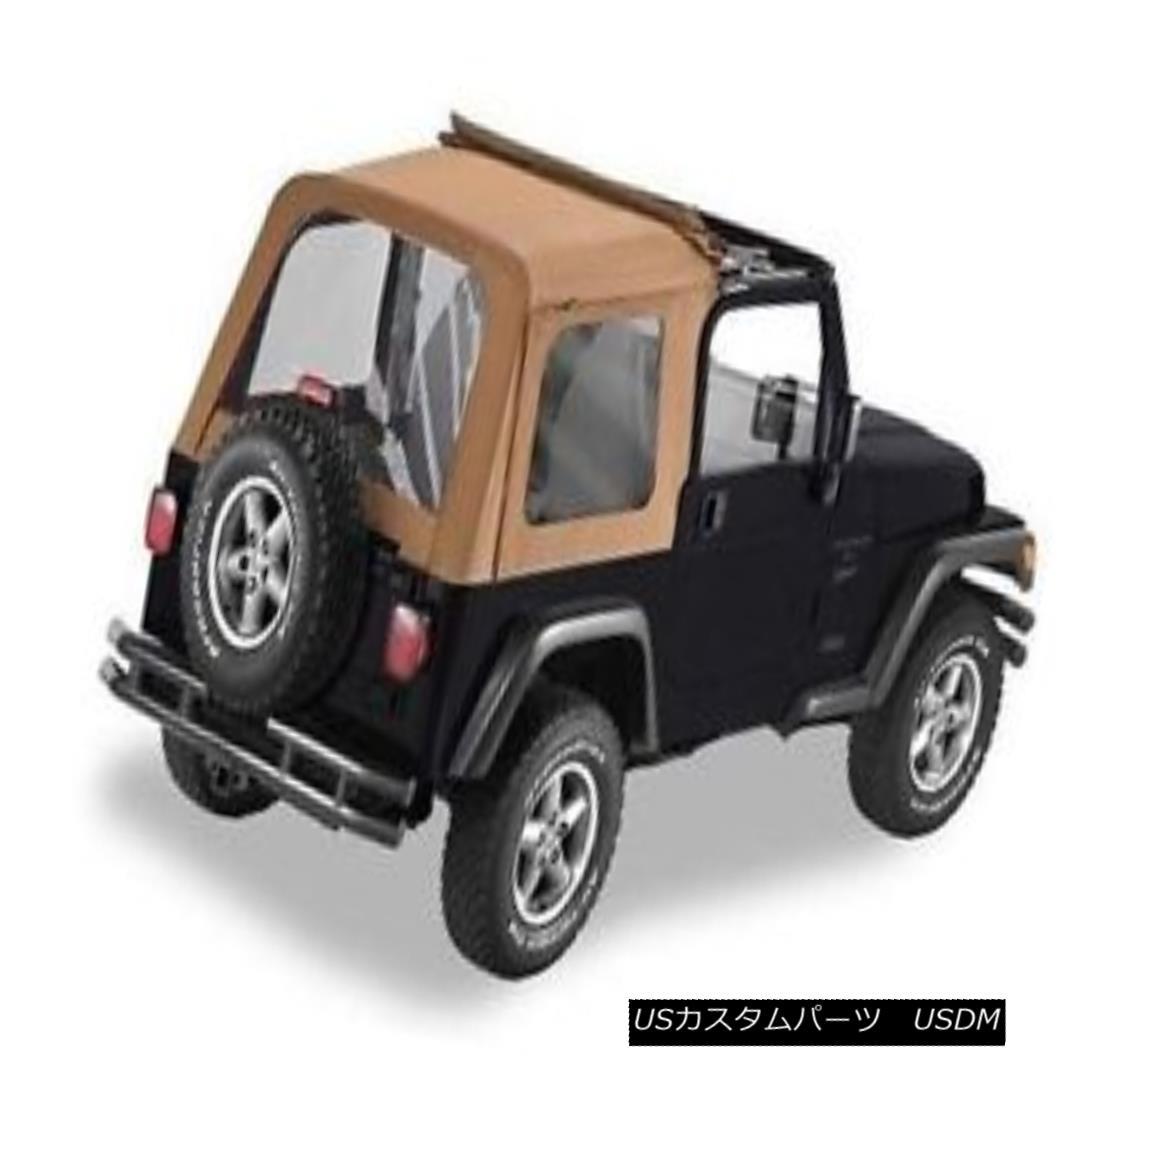 SPICE UPPER DOOR SKINS FRONT WINDOWS for 97-06 JEEP WRANGLER all Models